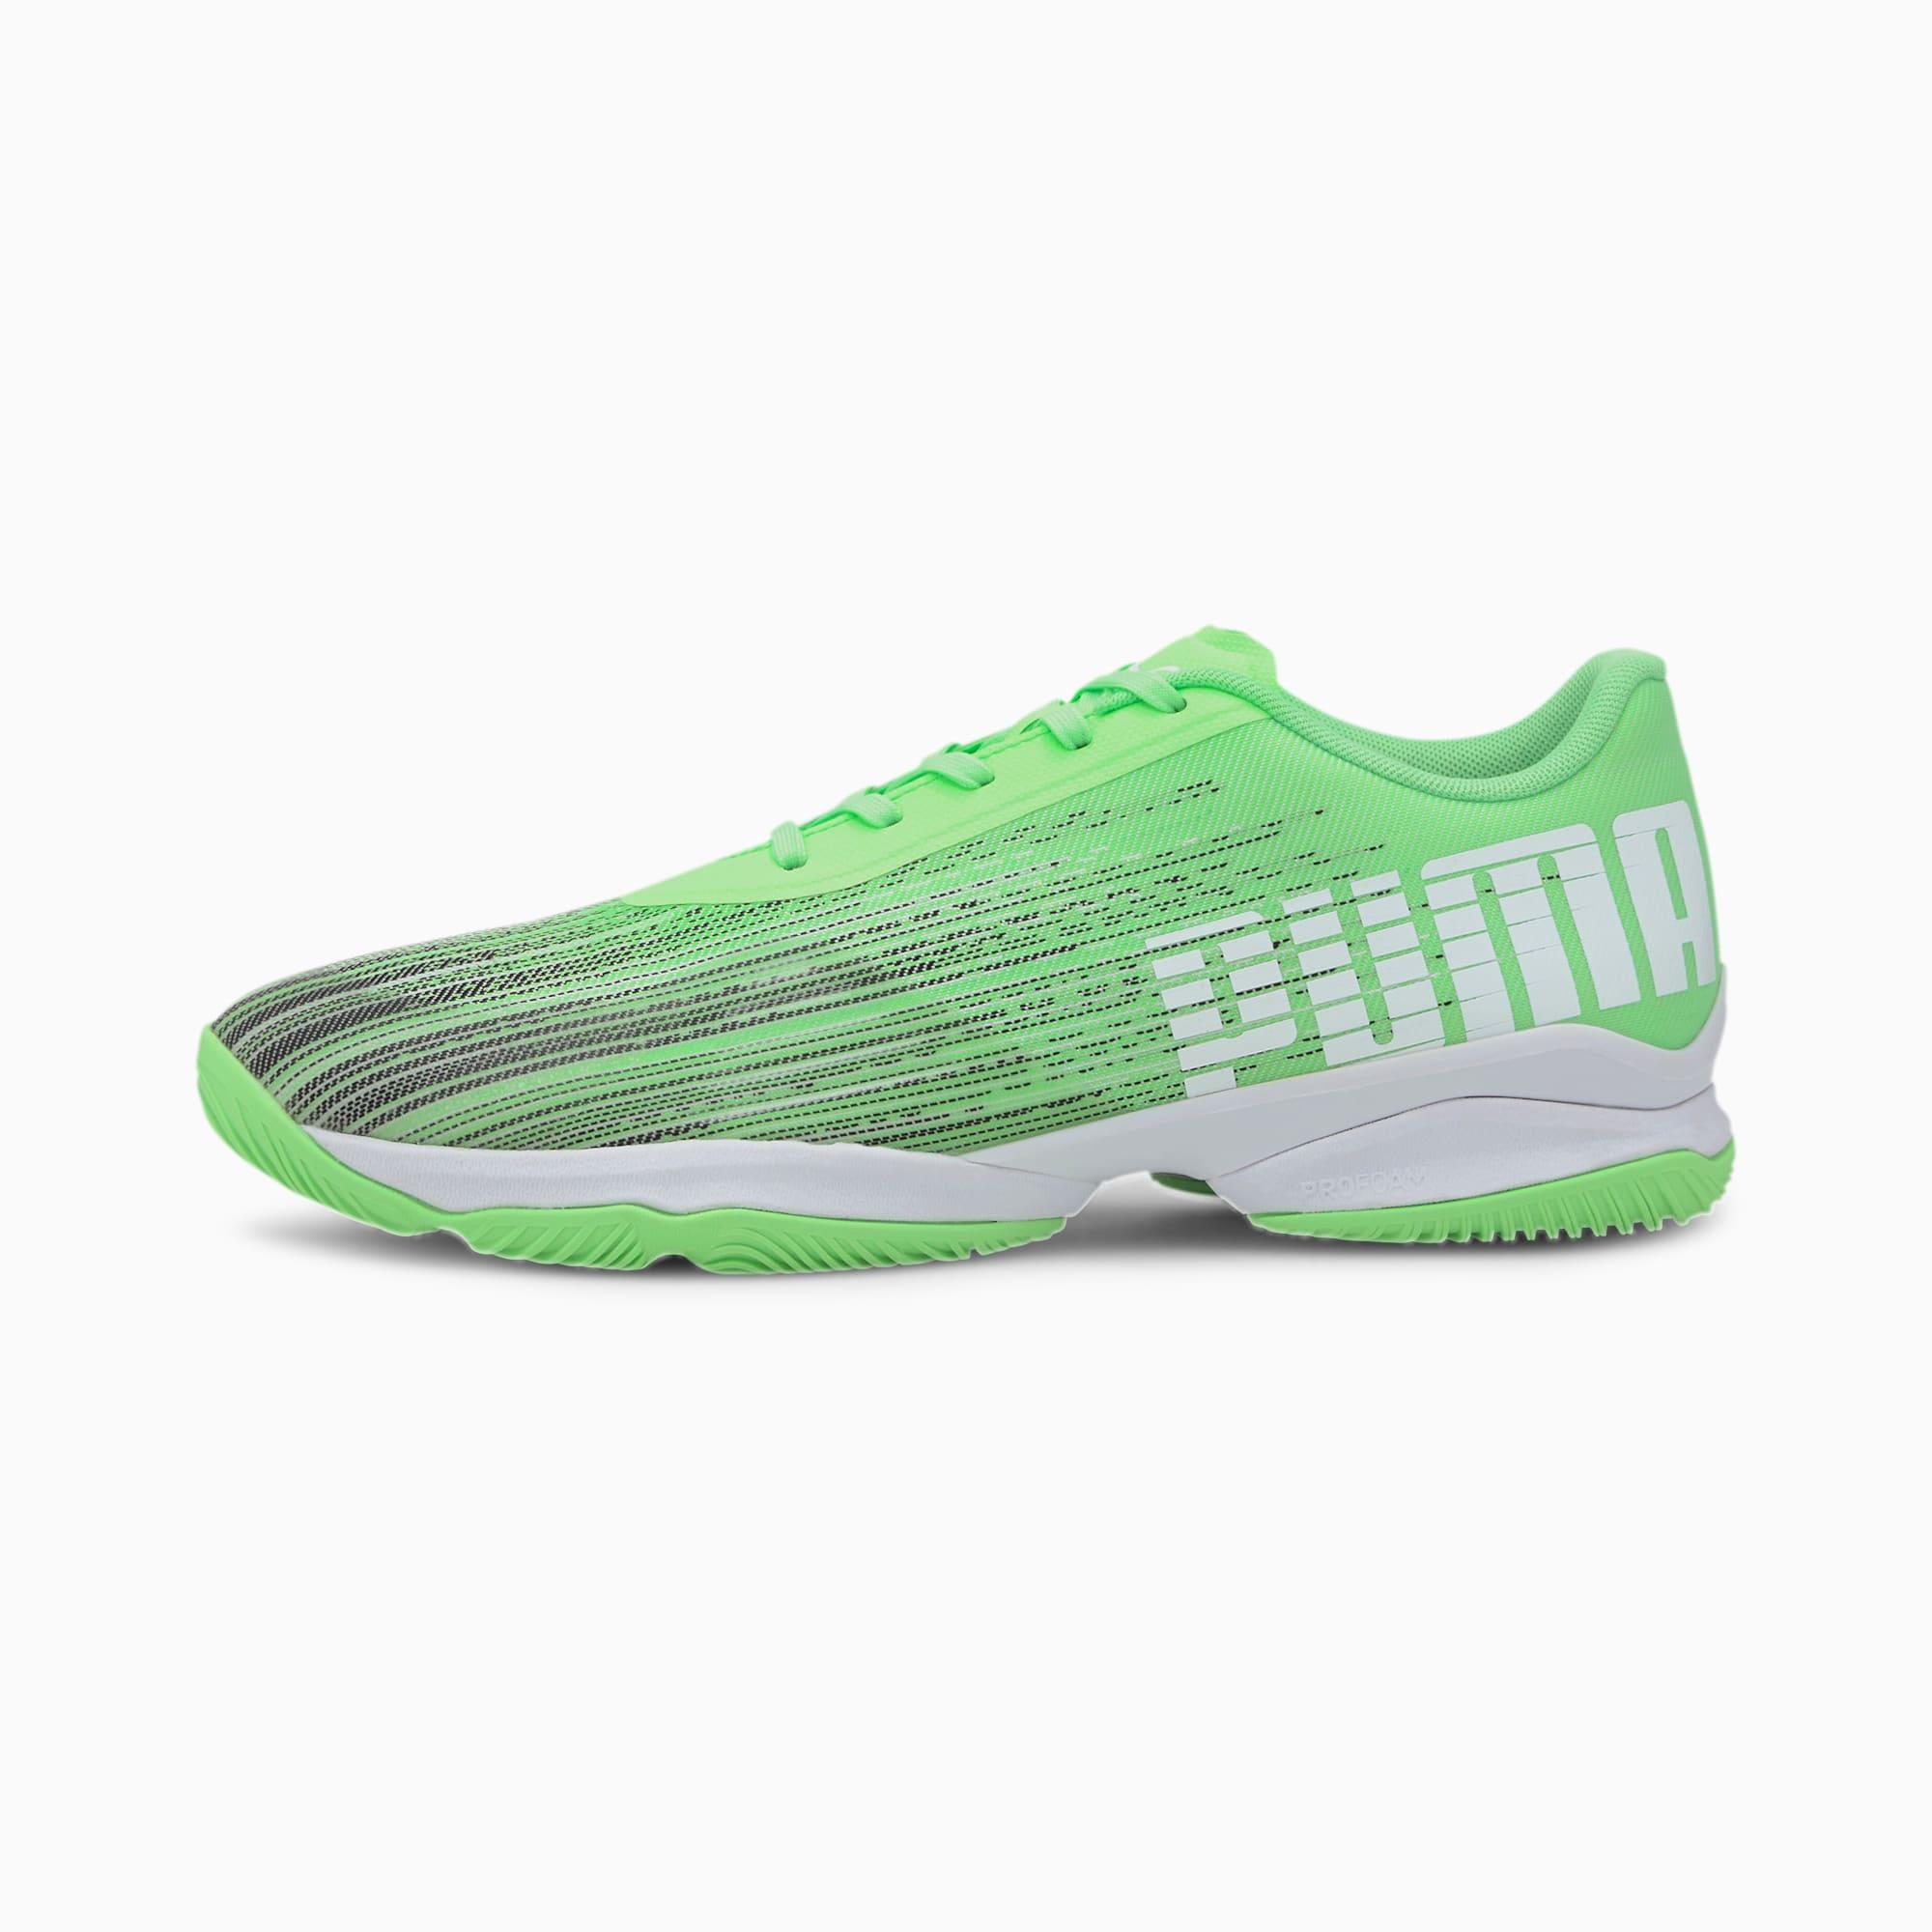 bruja realimentación otoño  Adrenalite 2.1 Handball Shoes   Elektro Green-Black-White   PUMA Shoes    PUMA